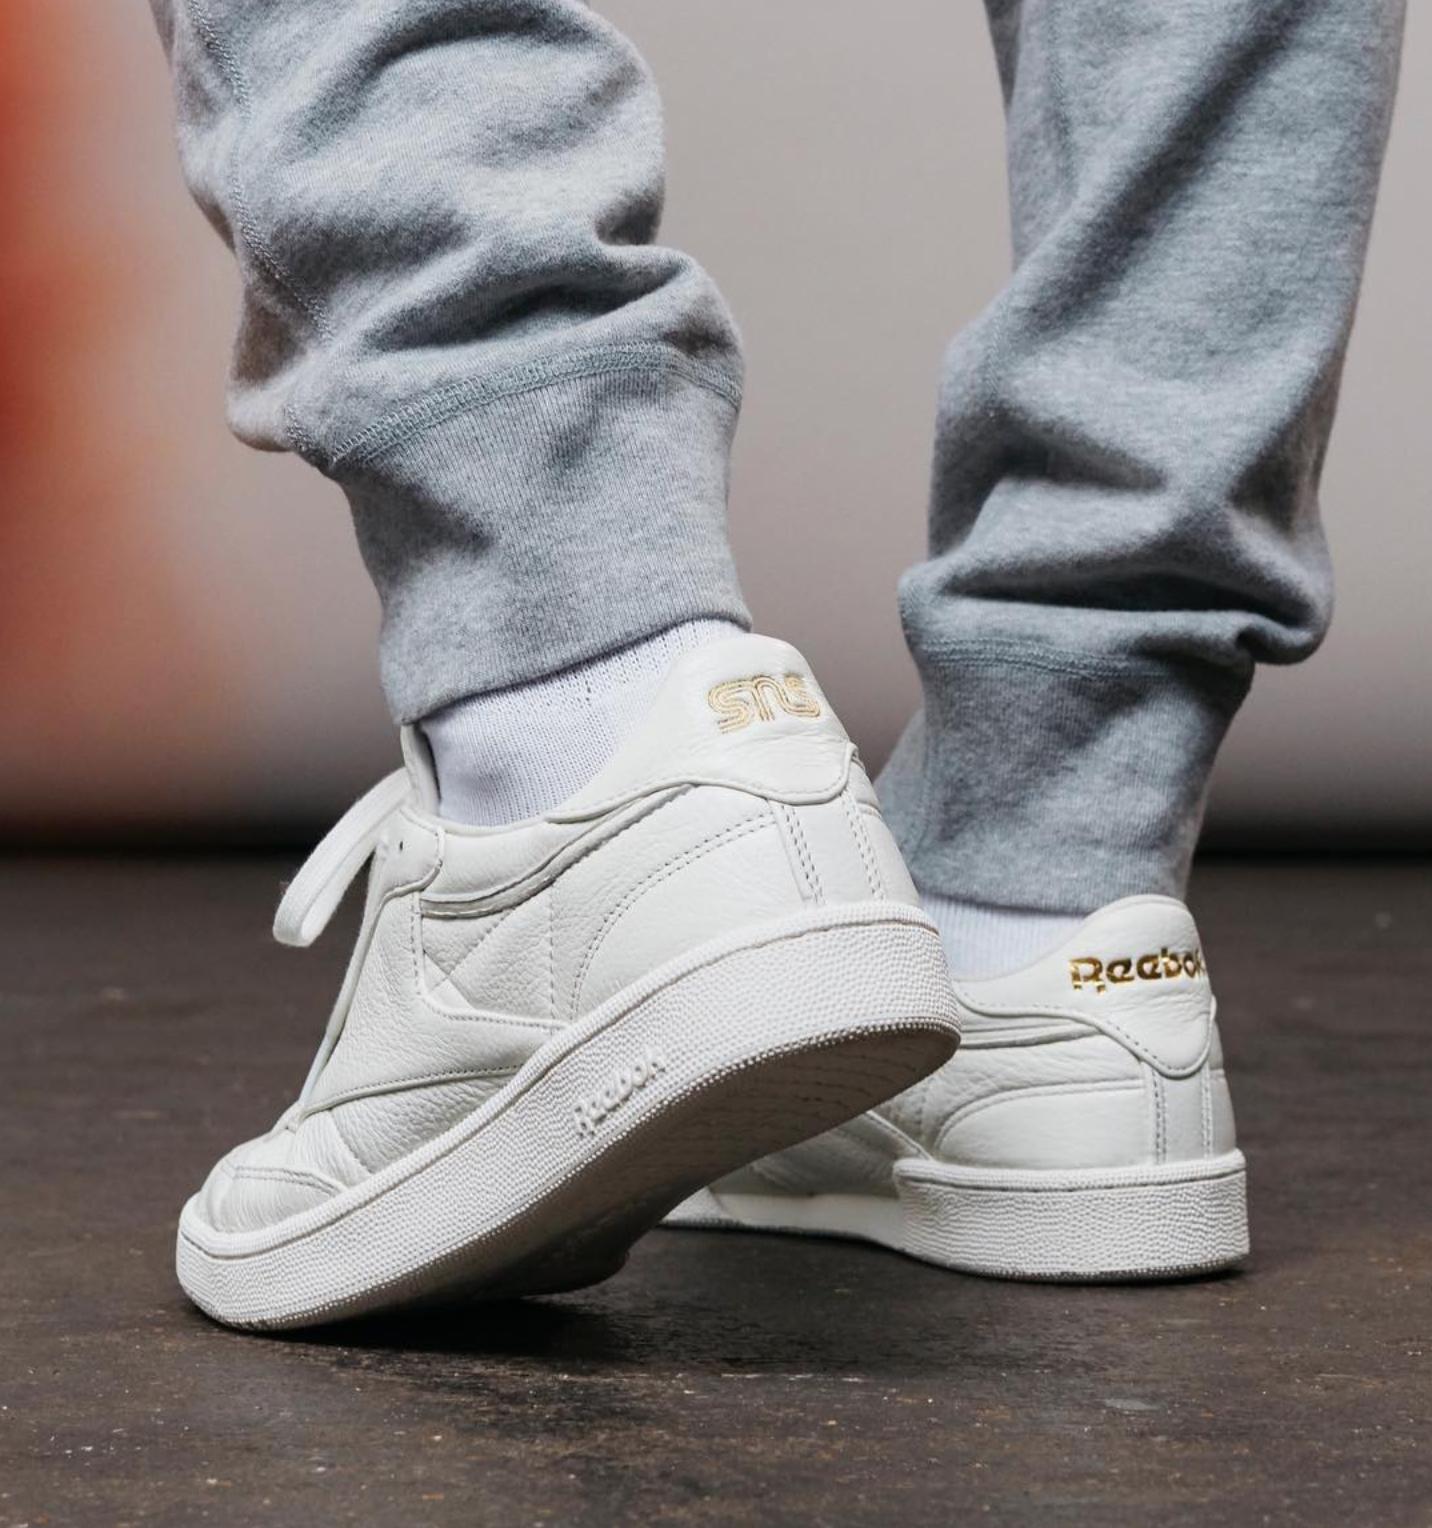 3e0f549a917 sneakersnstuff reebok club c 85 premium 4 - WearTesters